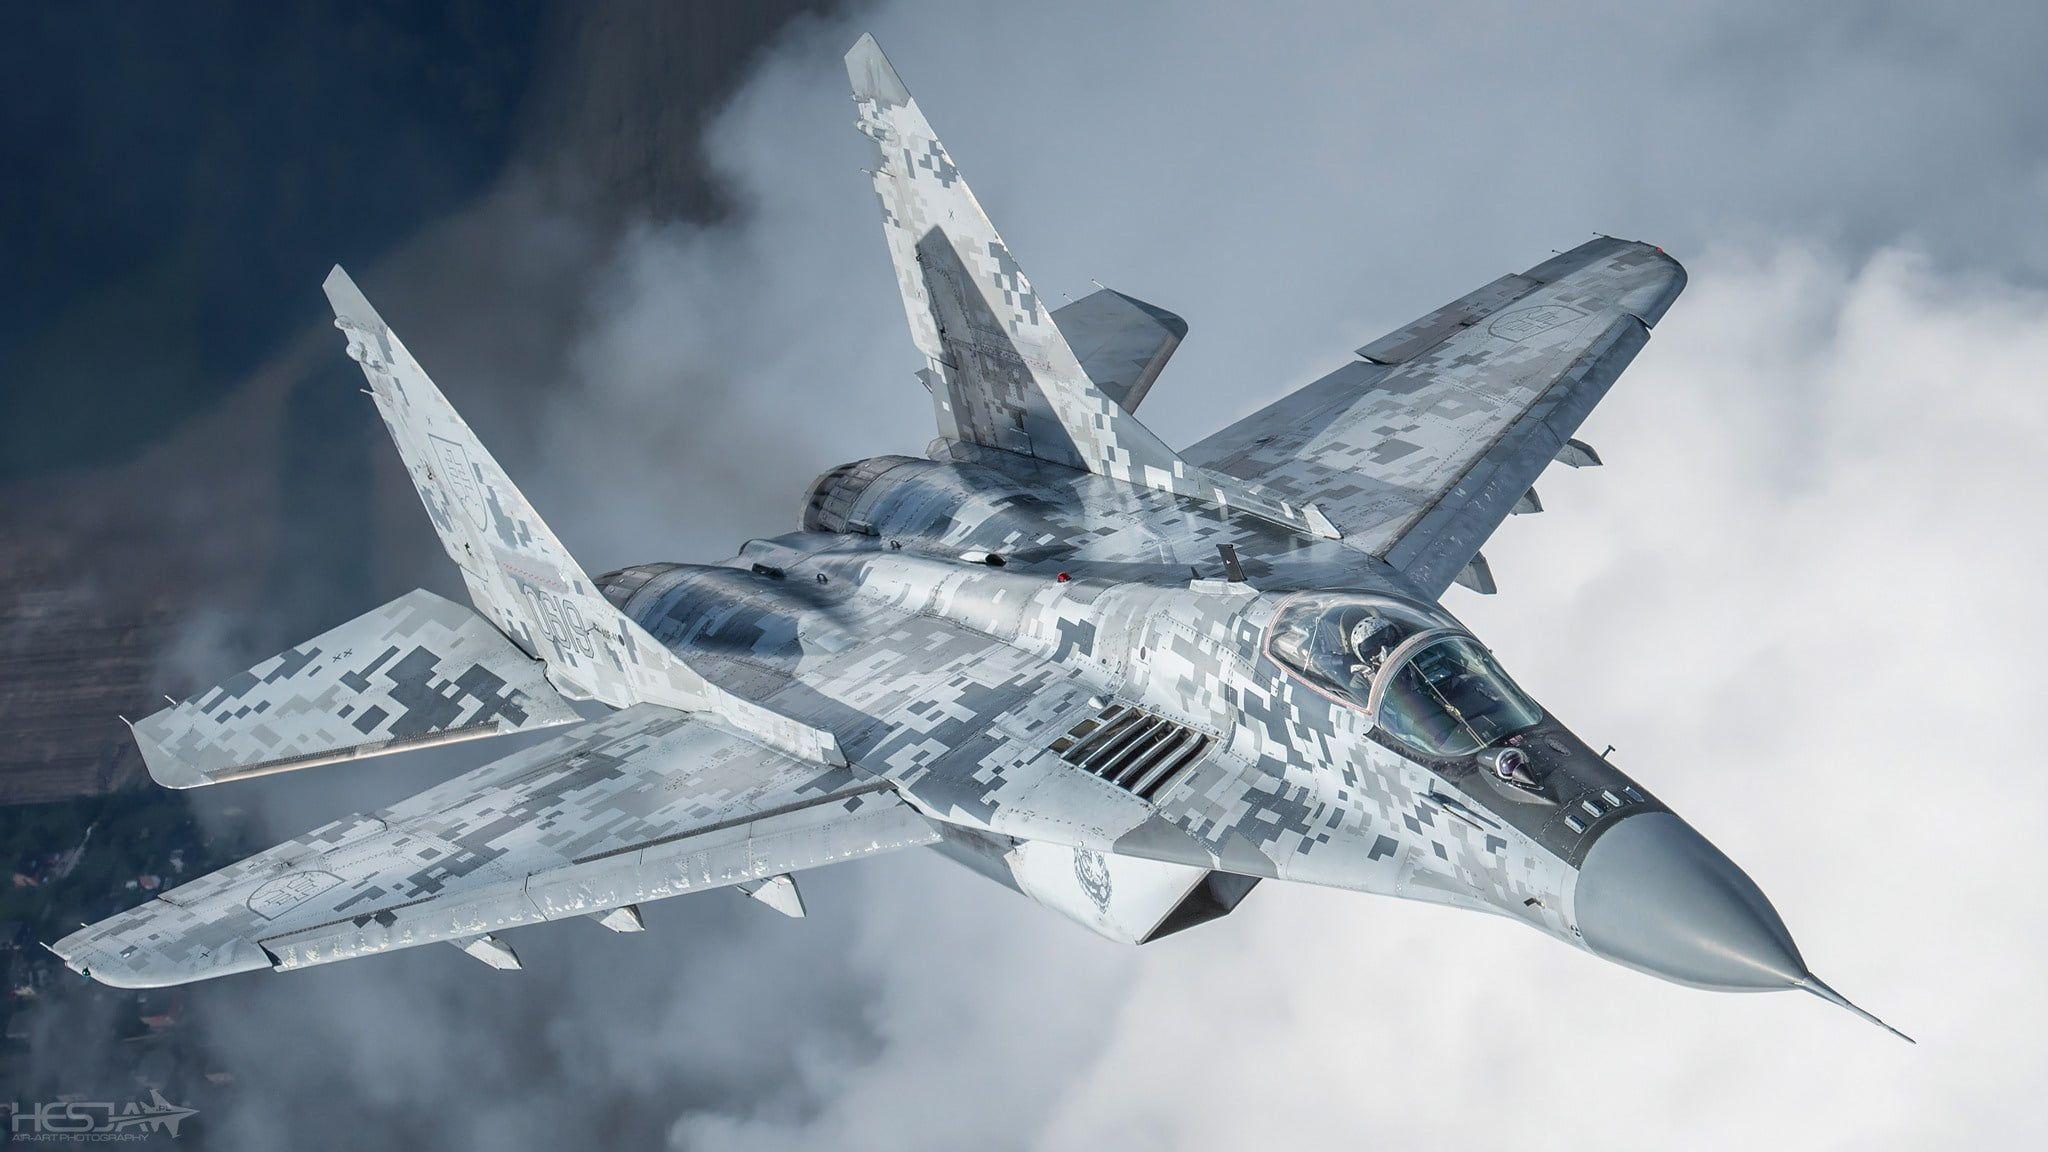 Jet Fighters Mikoyan Mig 29 Aircraft Jet Fighter Warplane 1080p Wallpaper Hdwallpaper Desktop Fighter Jets Fighter Aircraft Fighter 29 full hd wallpaper hd